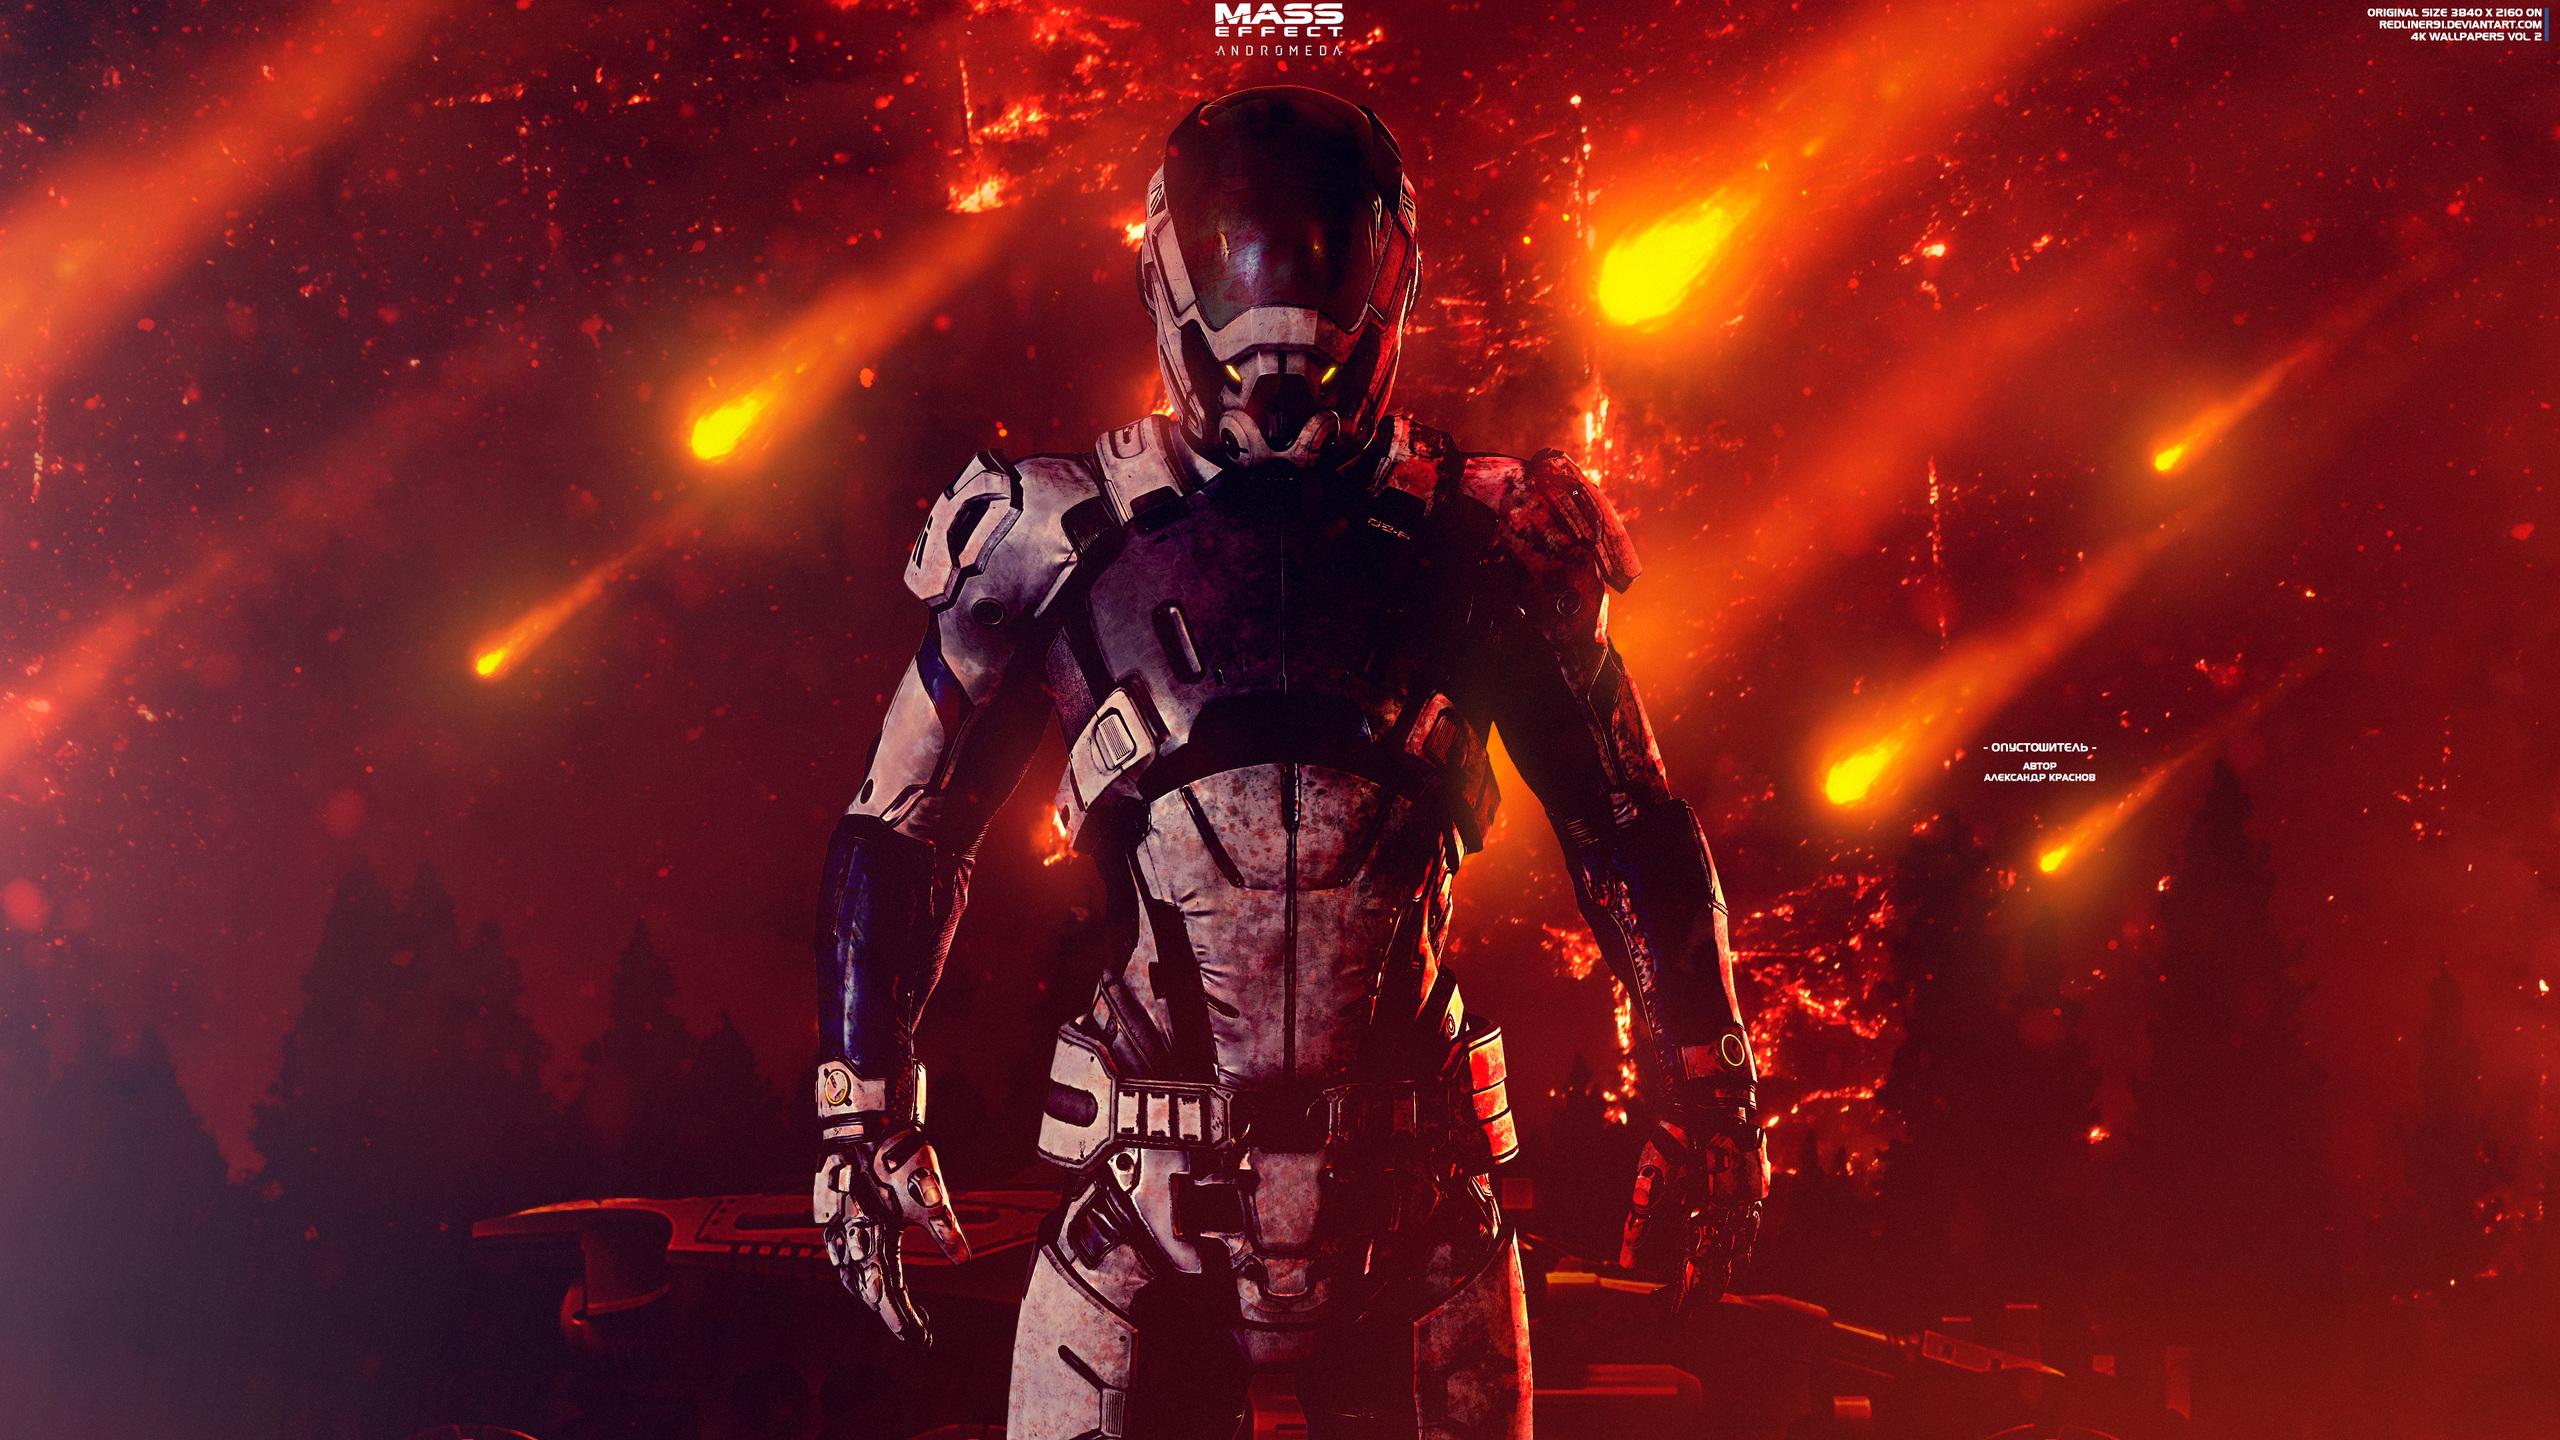 2560x1440 4k Mass Effect Andromeda HD 1440P Resolution HD